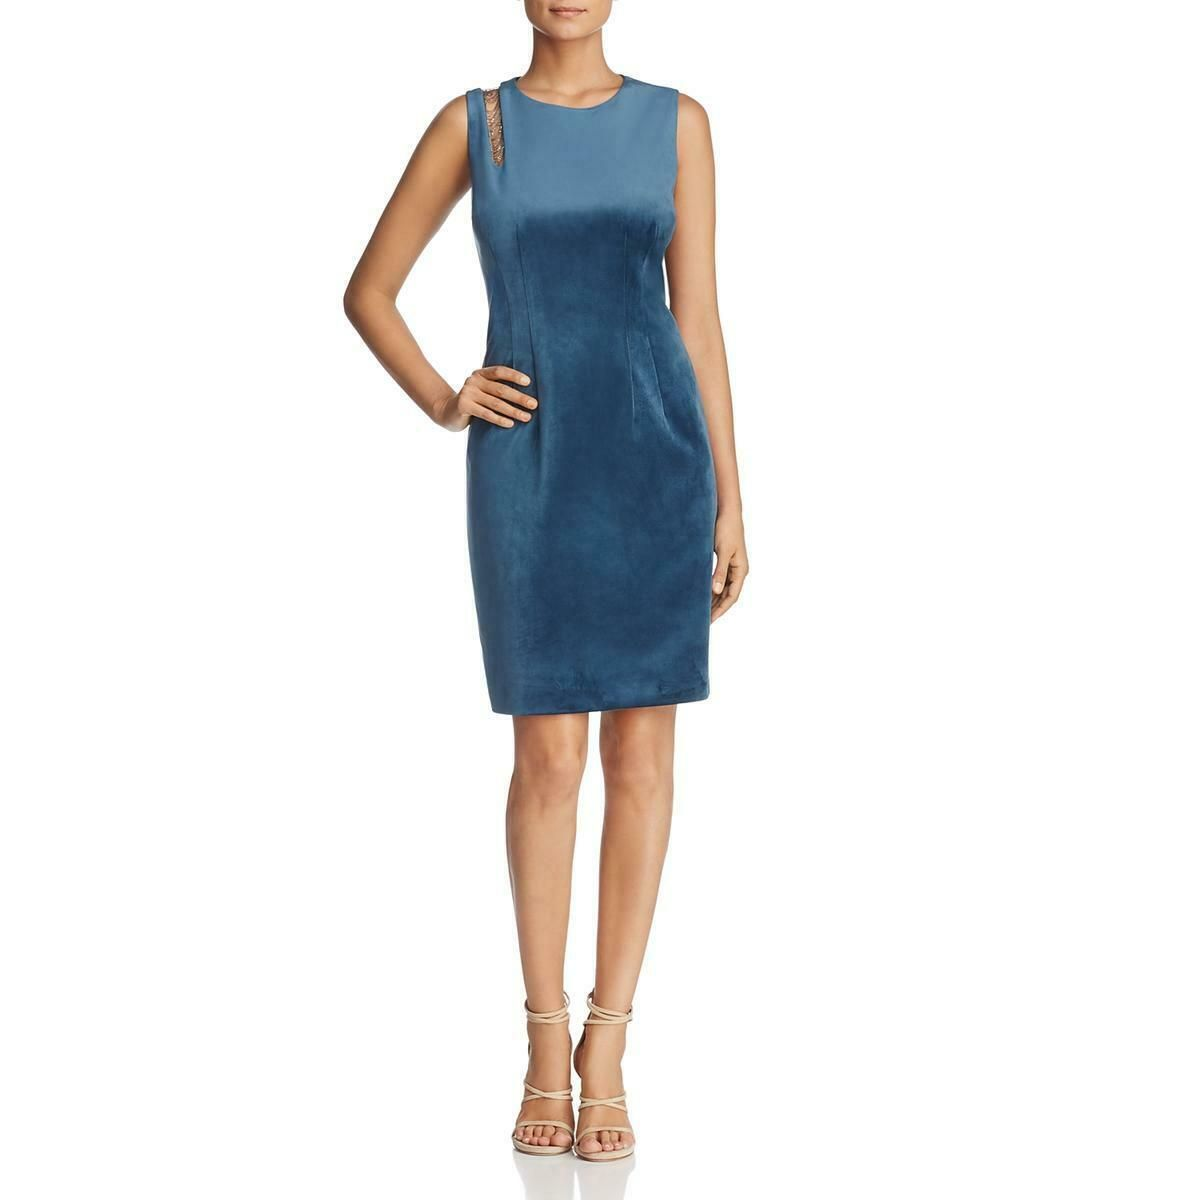 Elie Tahari Womens Emory Velvet Party Knee Length Cocktail Dress Bhfo 8537 Dress Honey Cutout Shoulder Dress Mini Dress Formal Knee Length Cocktail Dress [ 1200 x 1200 Pixel ]